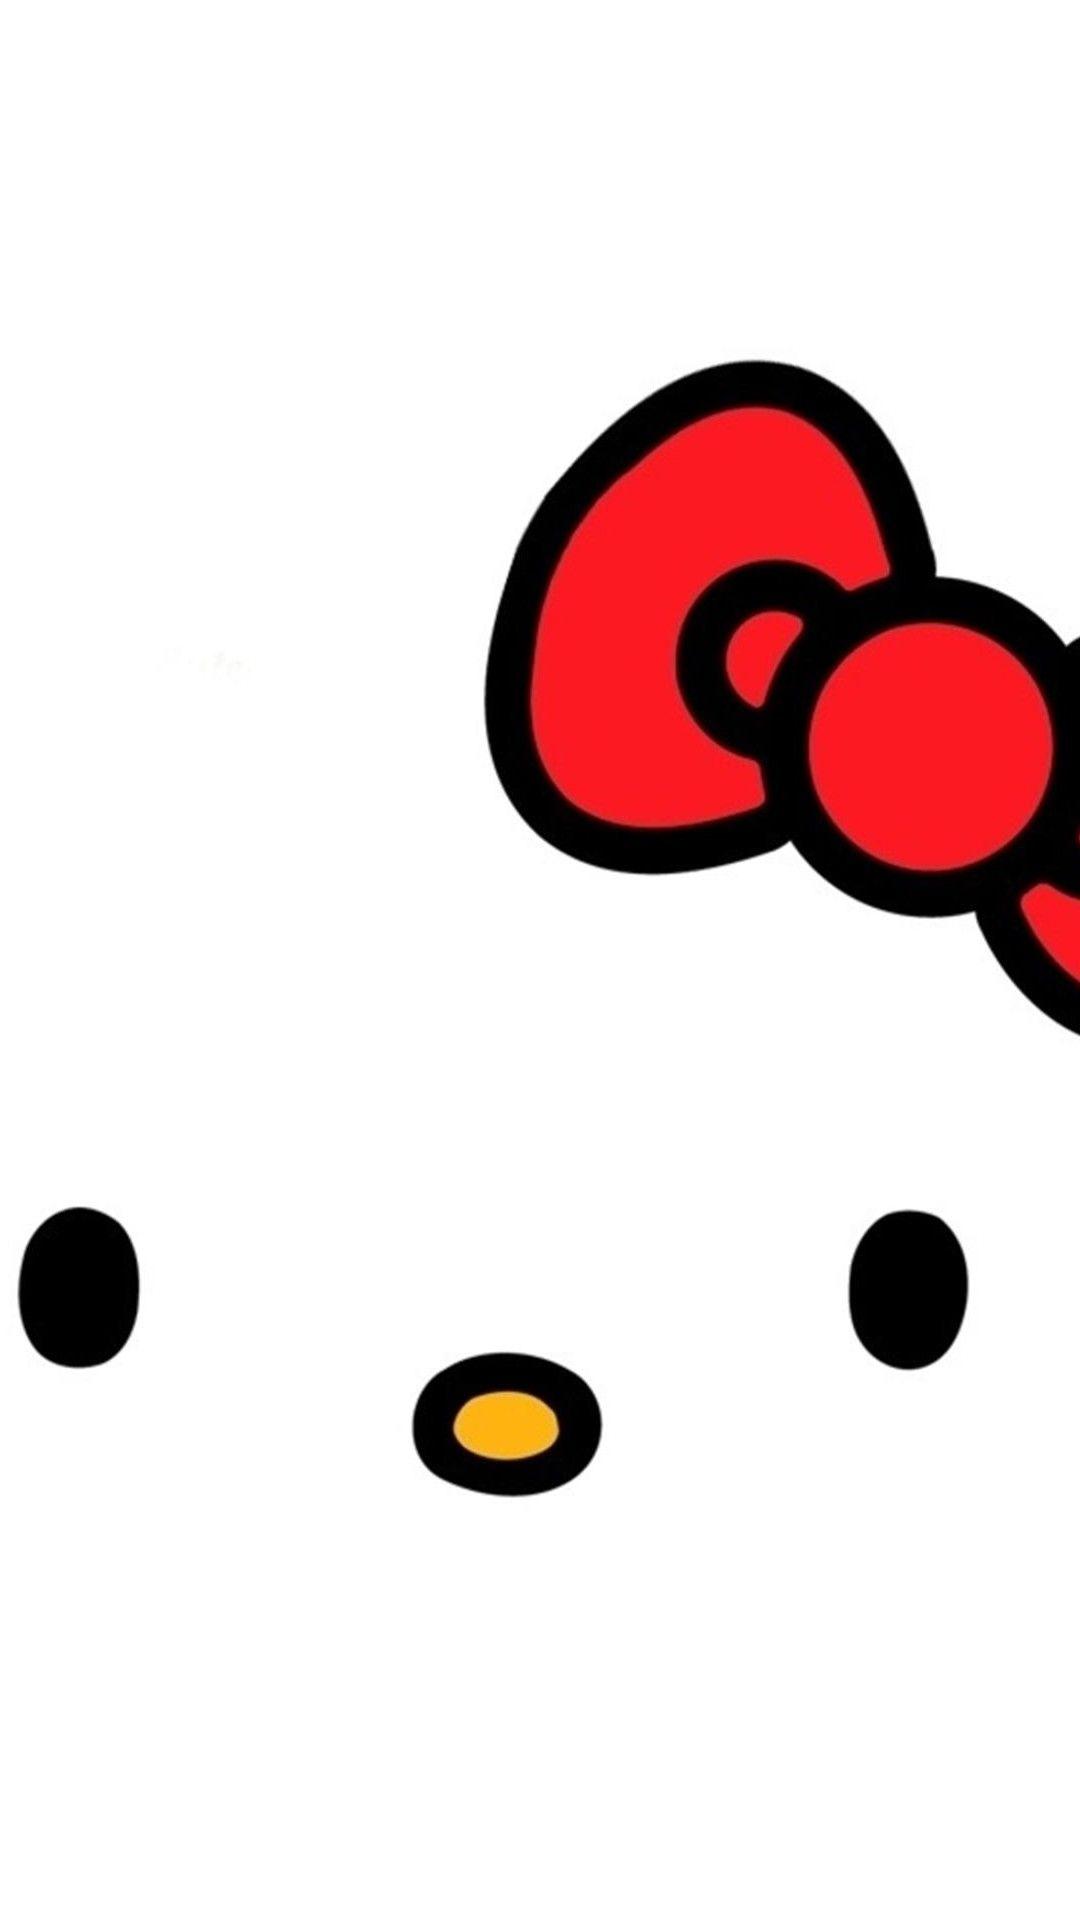 Great Wallpaper Hello Kitty Iphone 6s Plus - 532b601bfe96ff1865da2609fc3c0c51  HD_426614.jpg